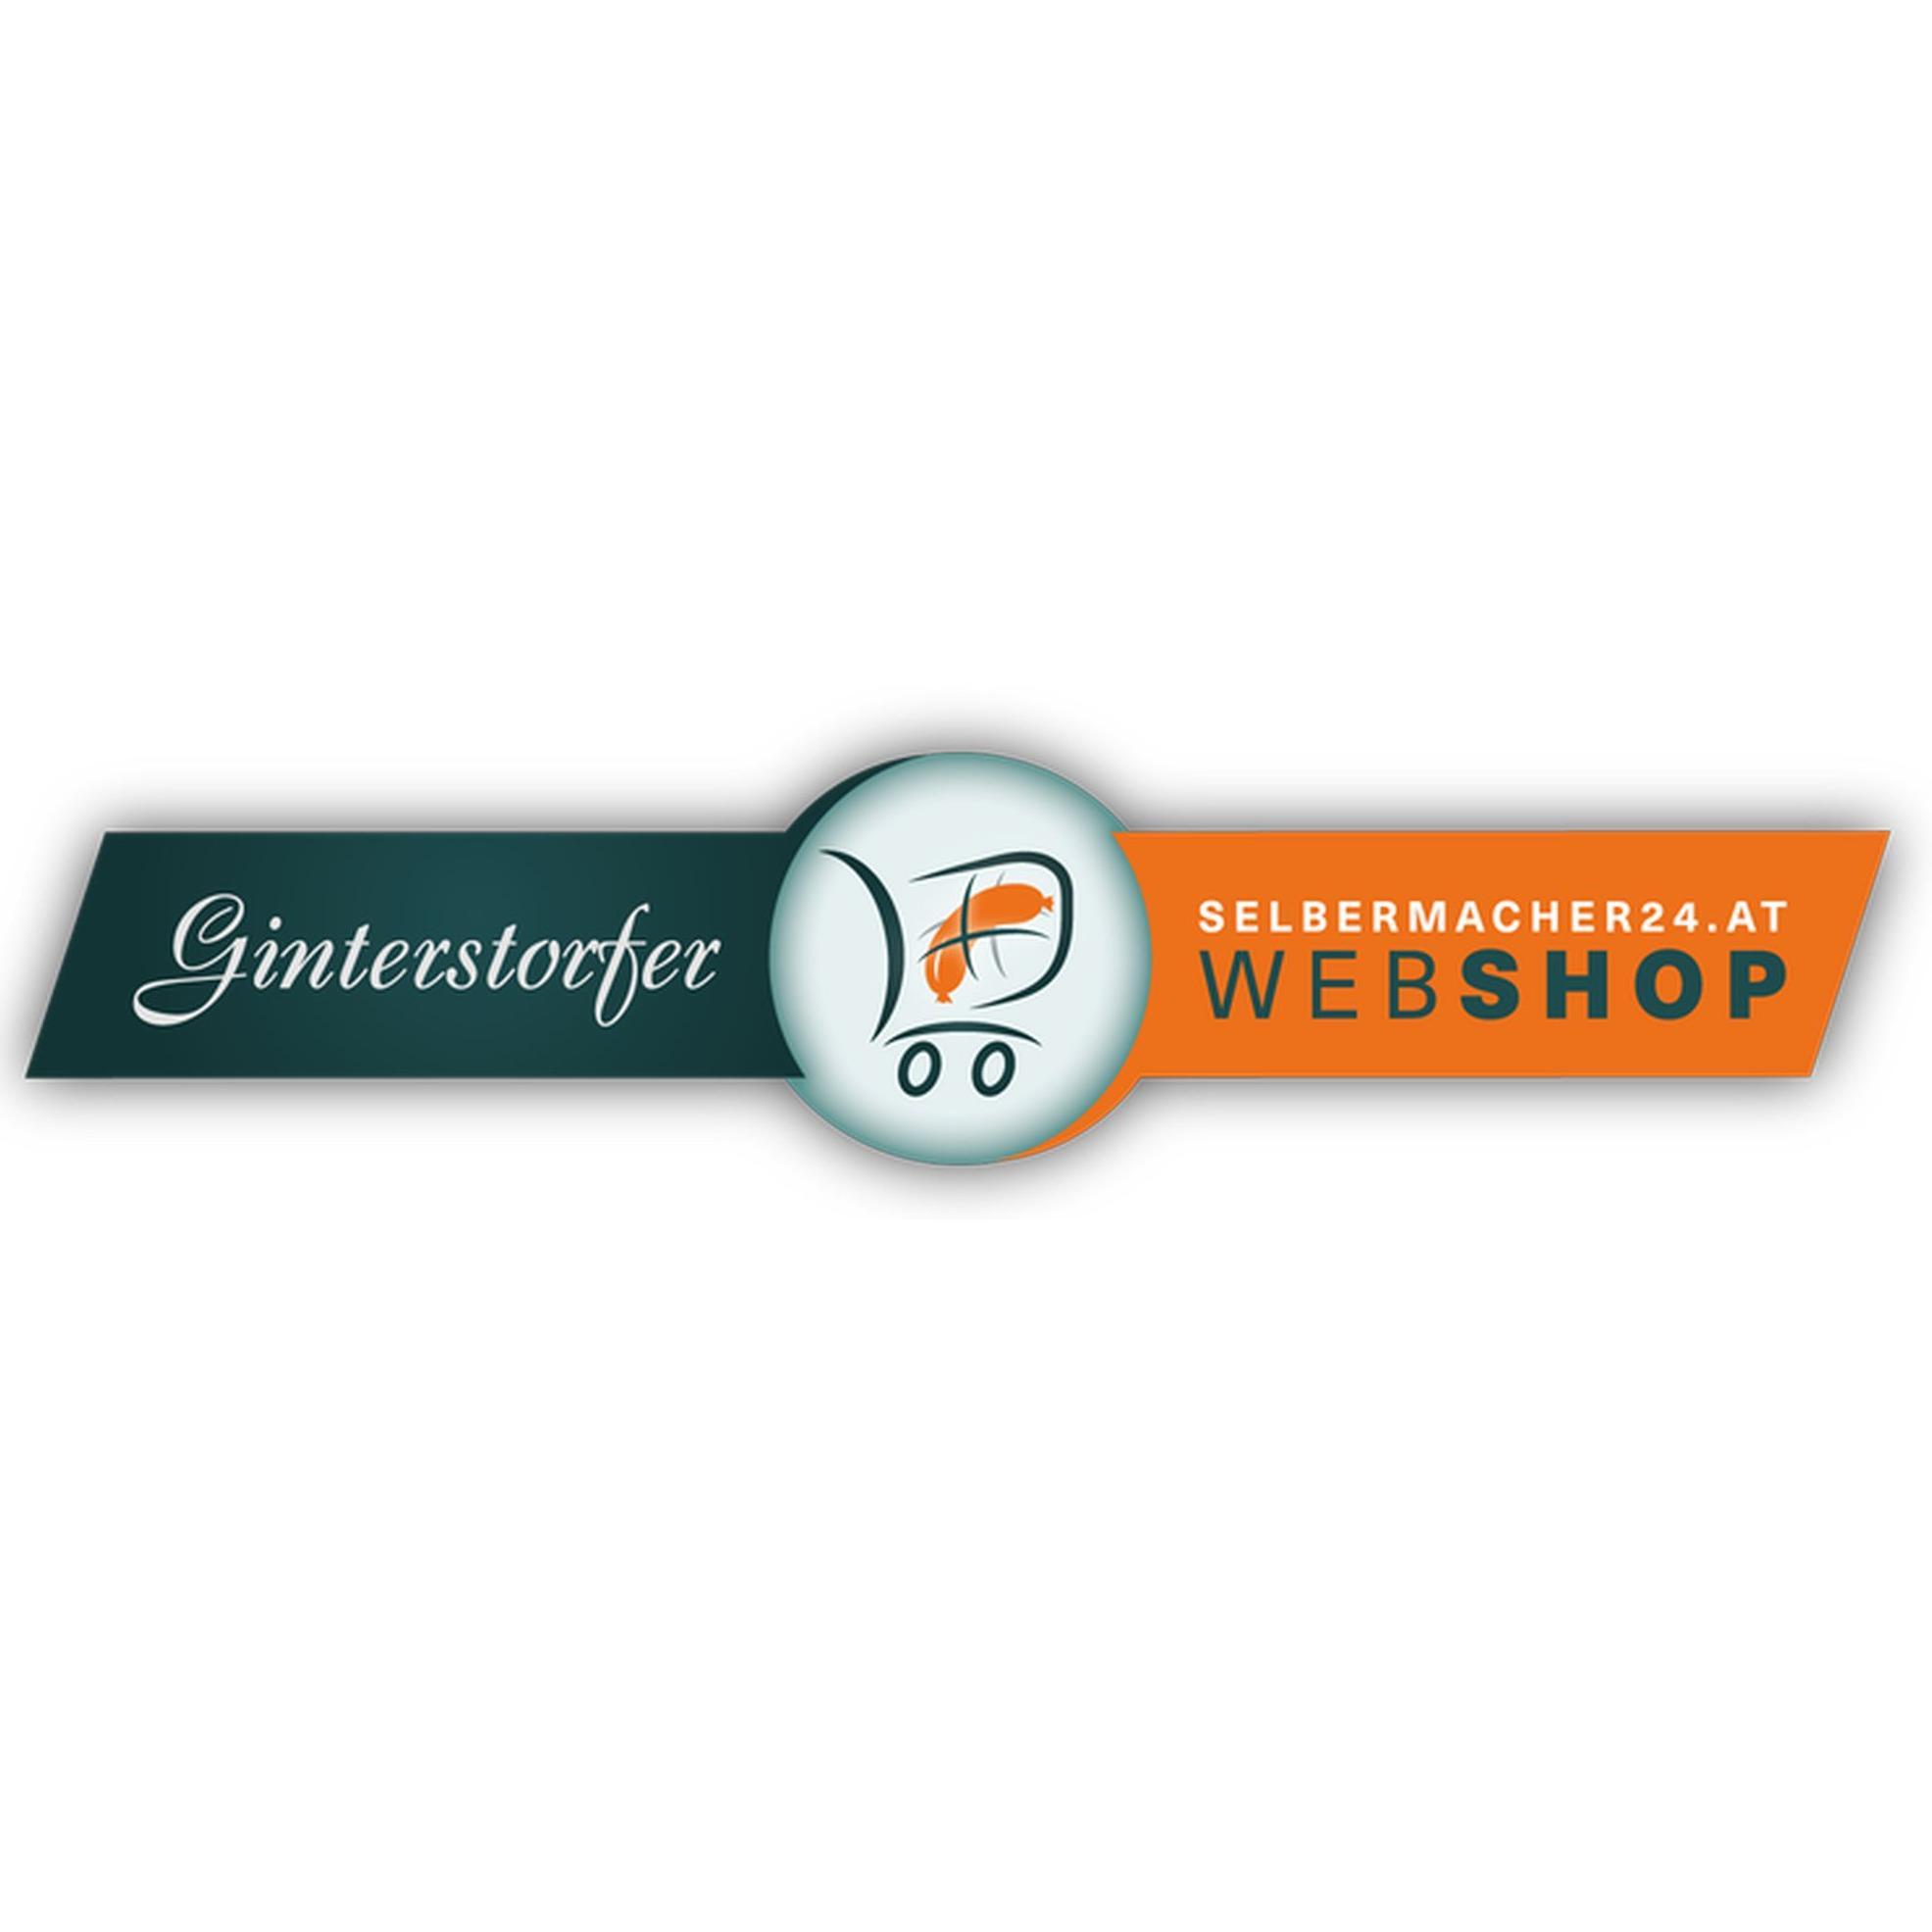 Ginterstorfer GmbH & Co KG